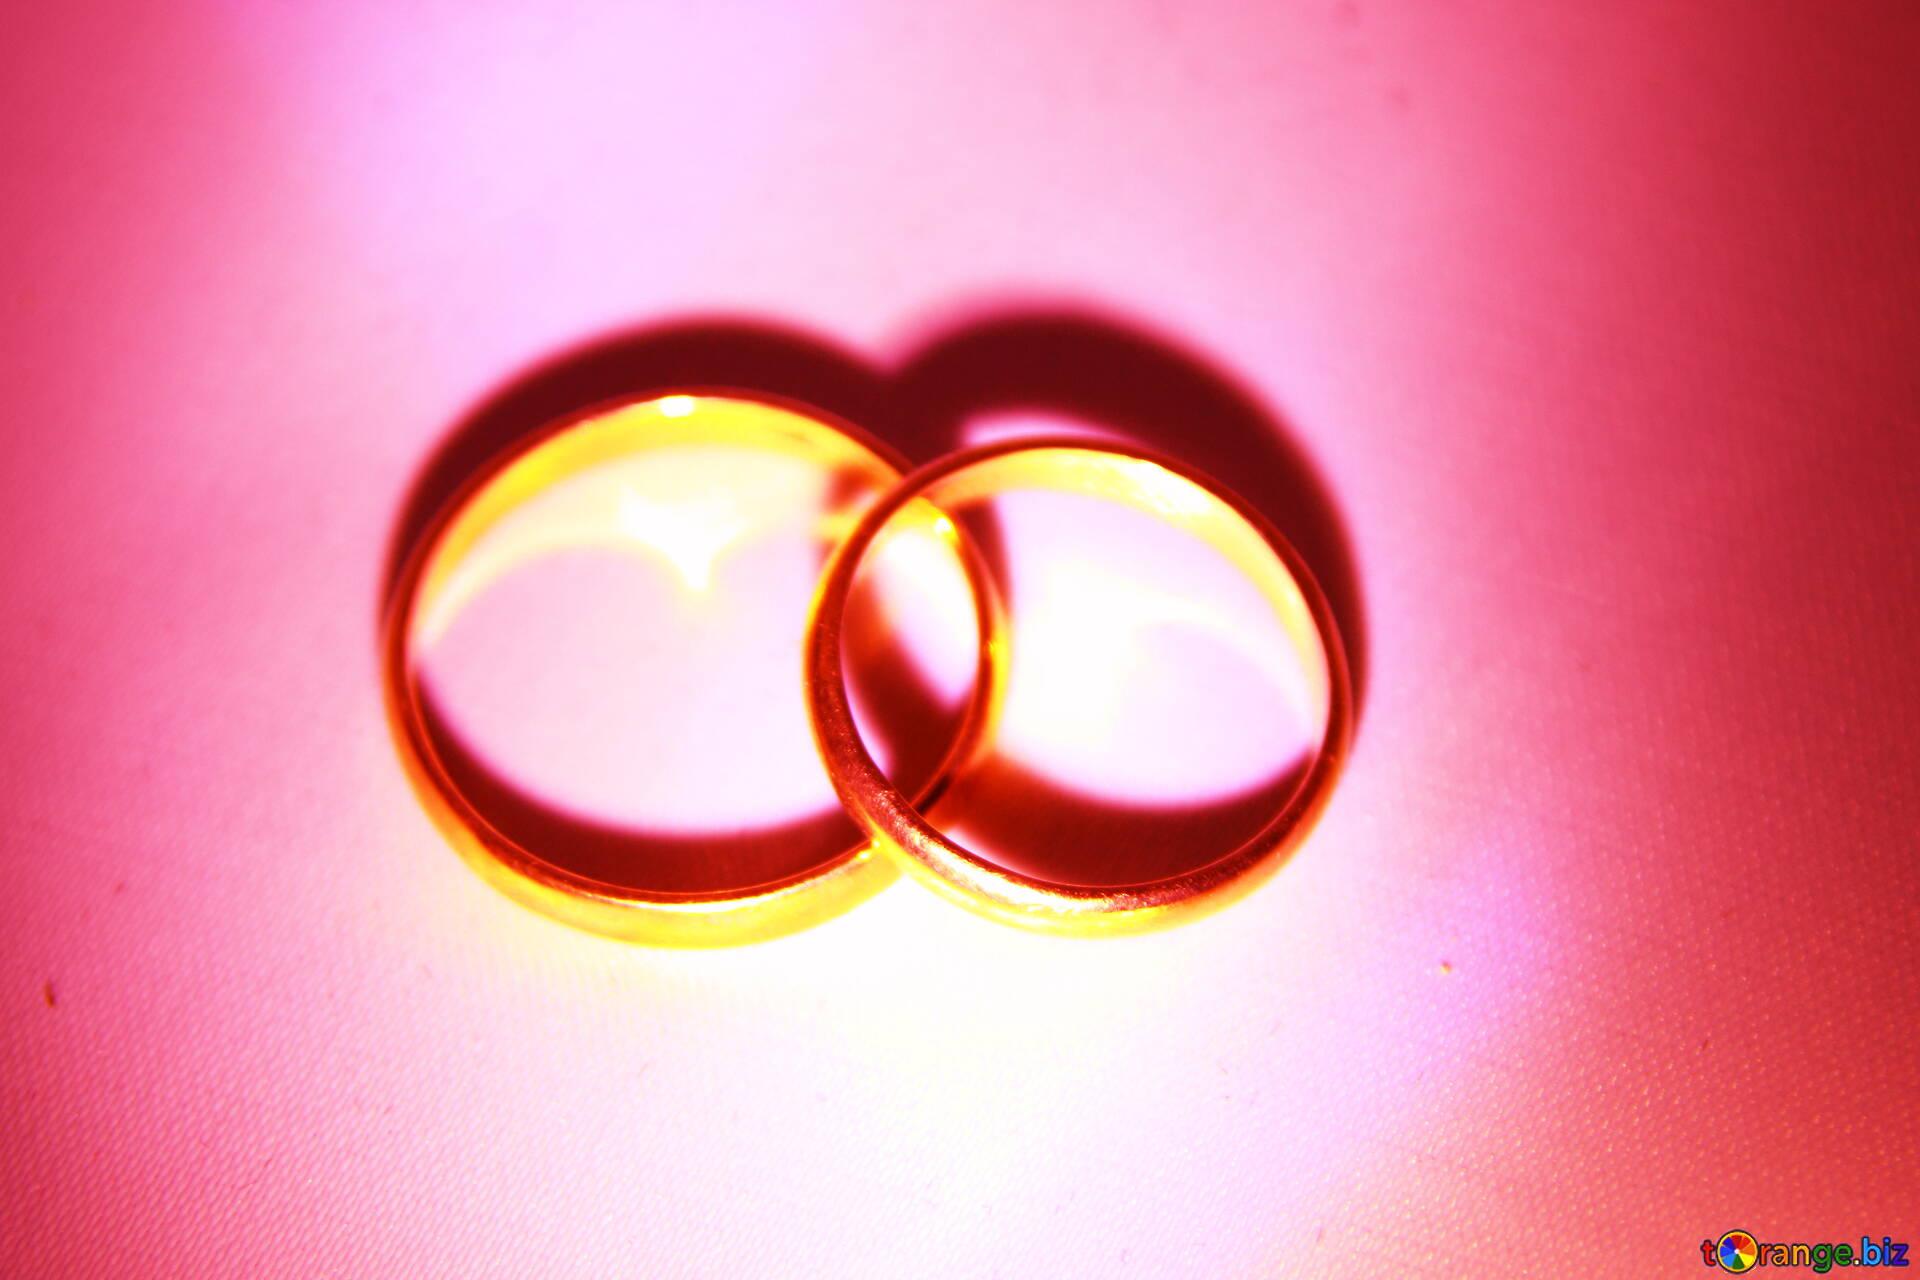 Gold rings weddings ring № 3659